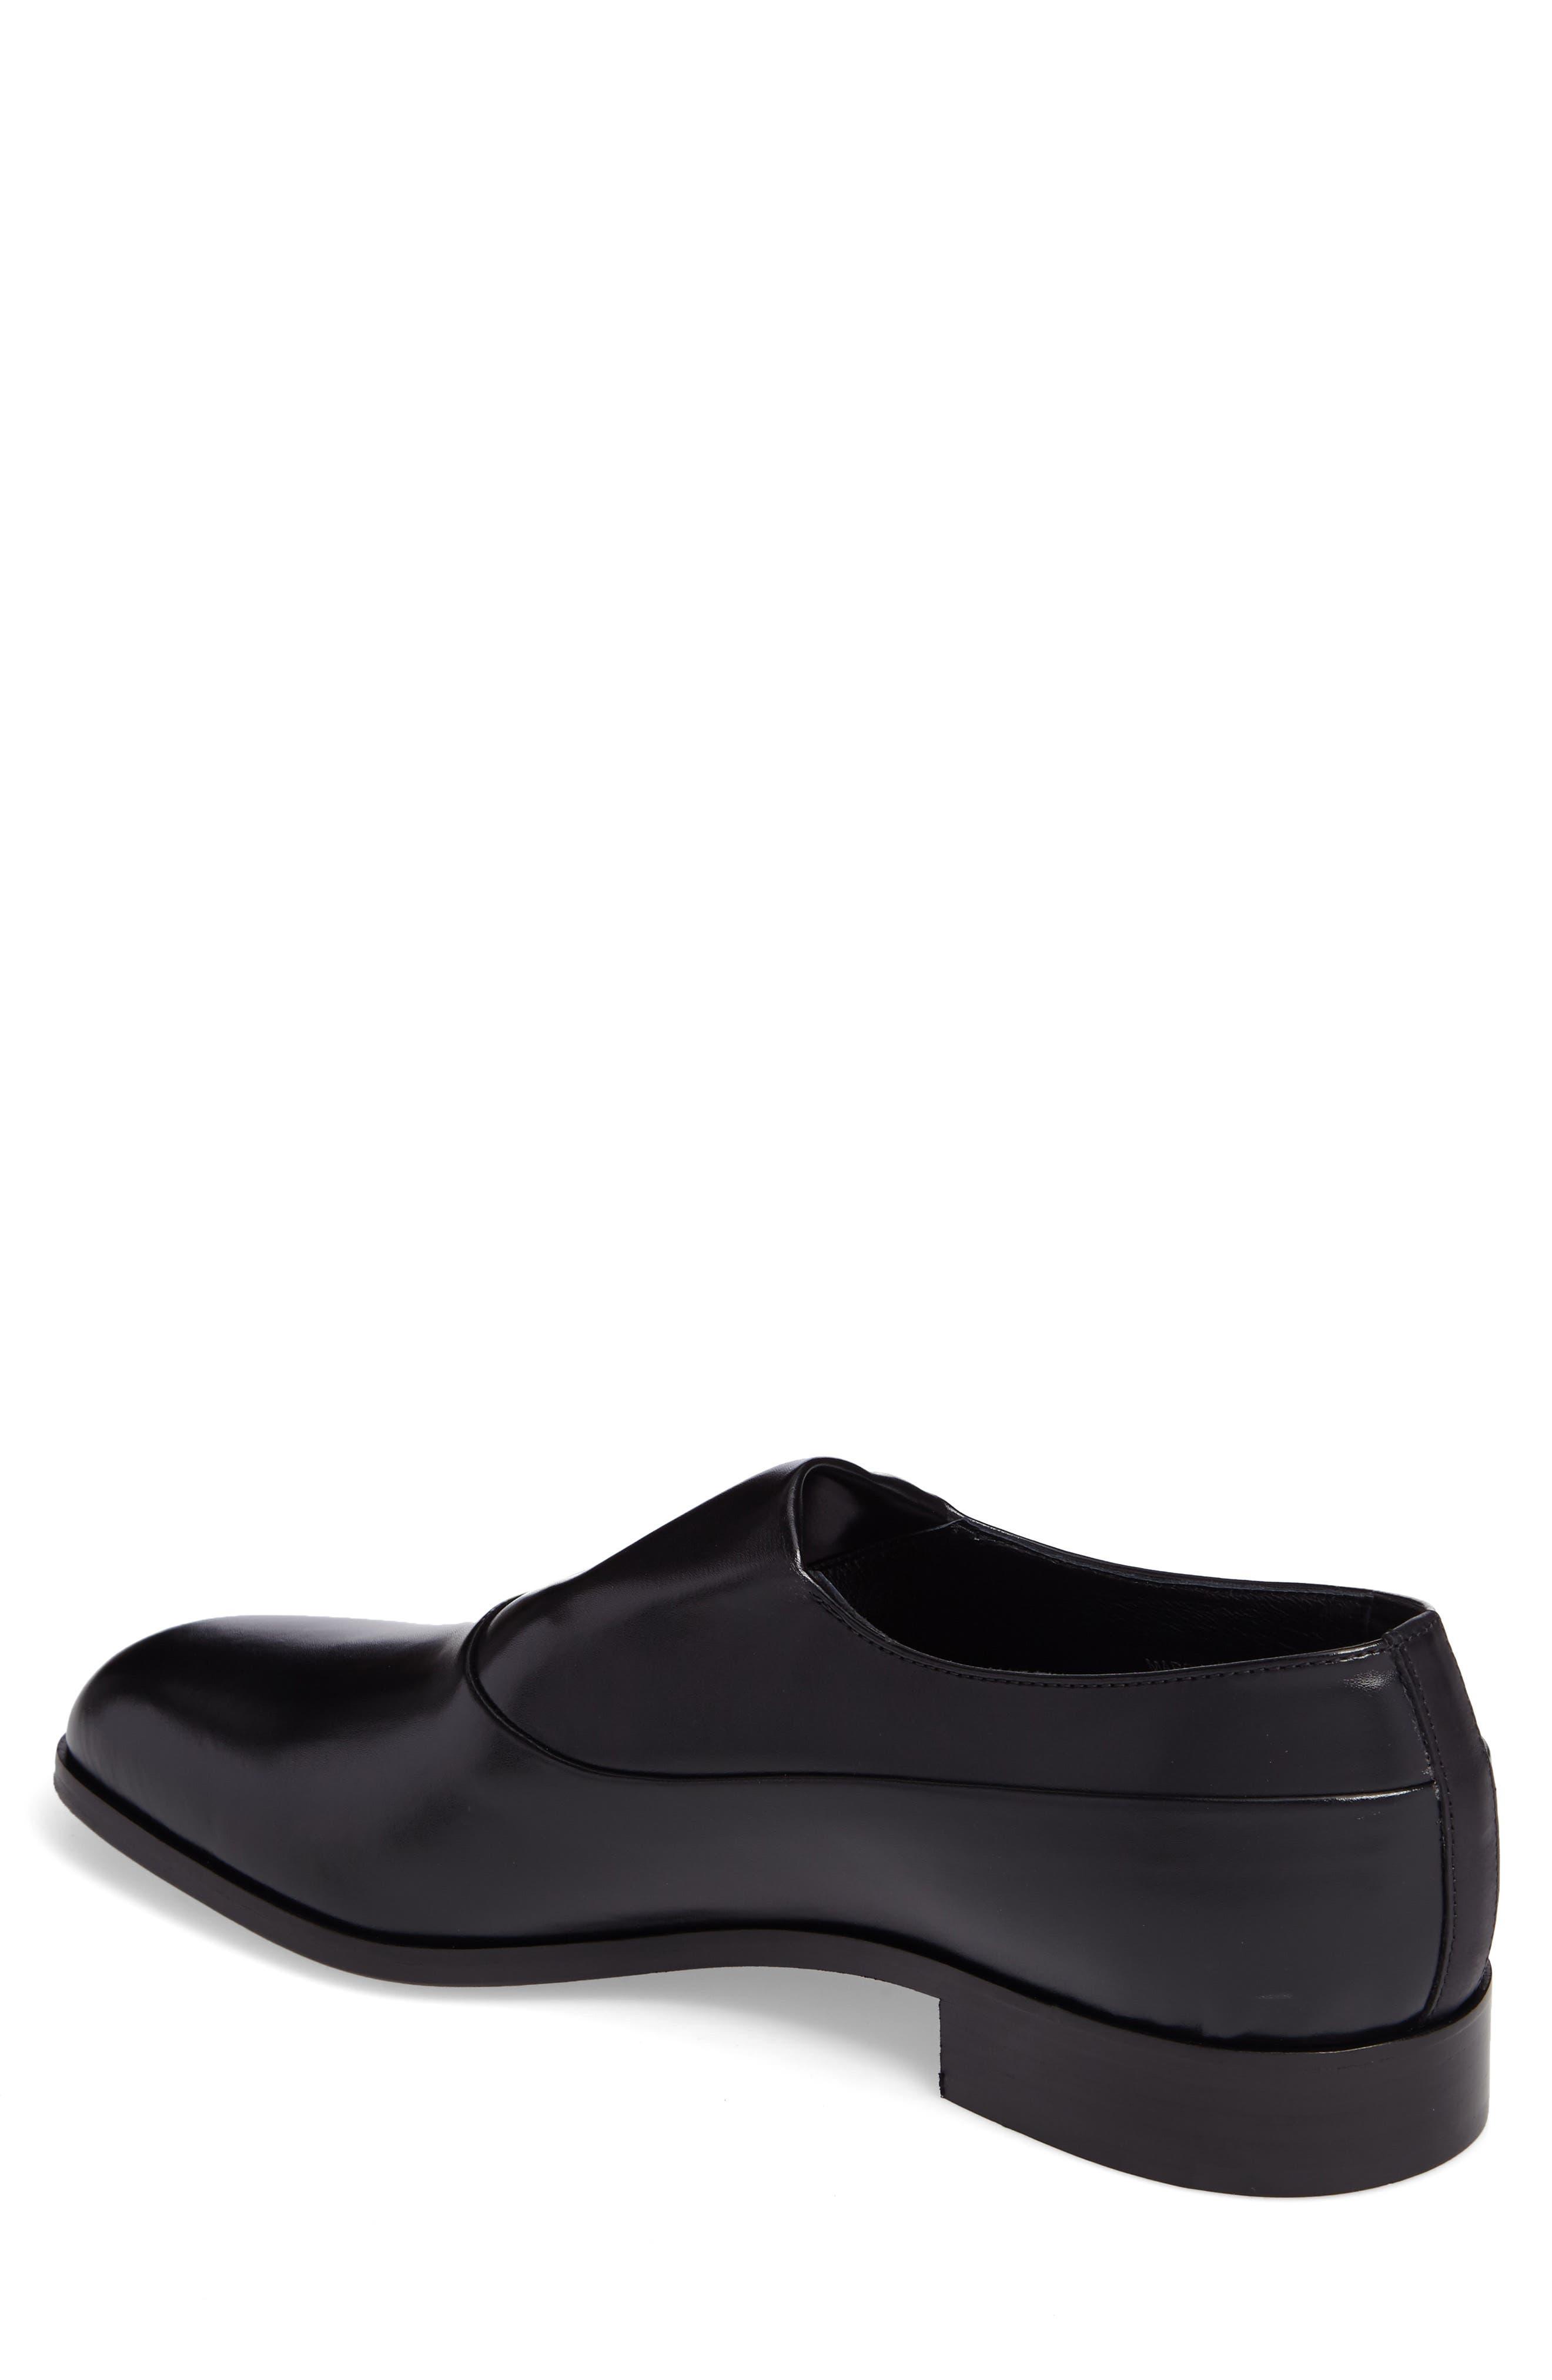 Marcio Venetian Loafer,                             Alternate thumbnail 2, color,                             Black